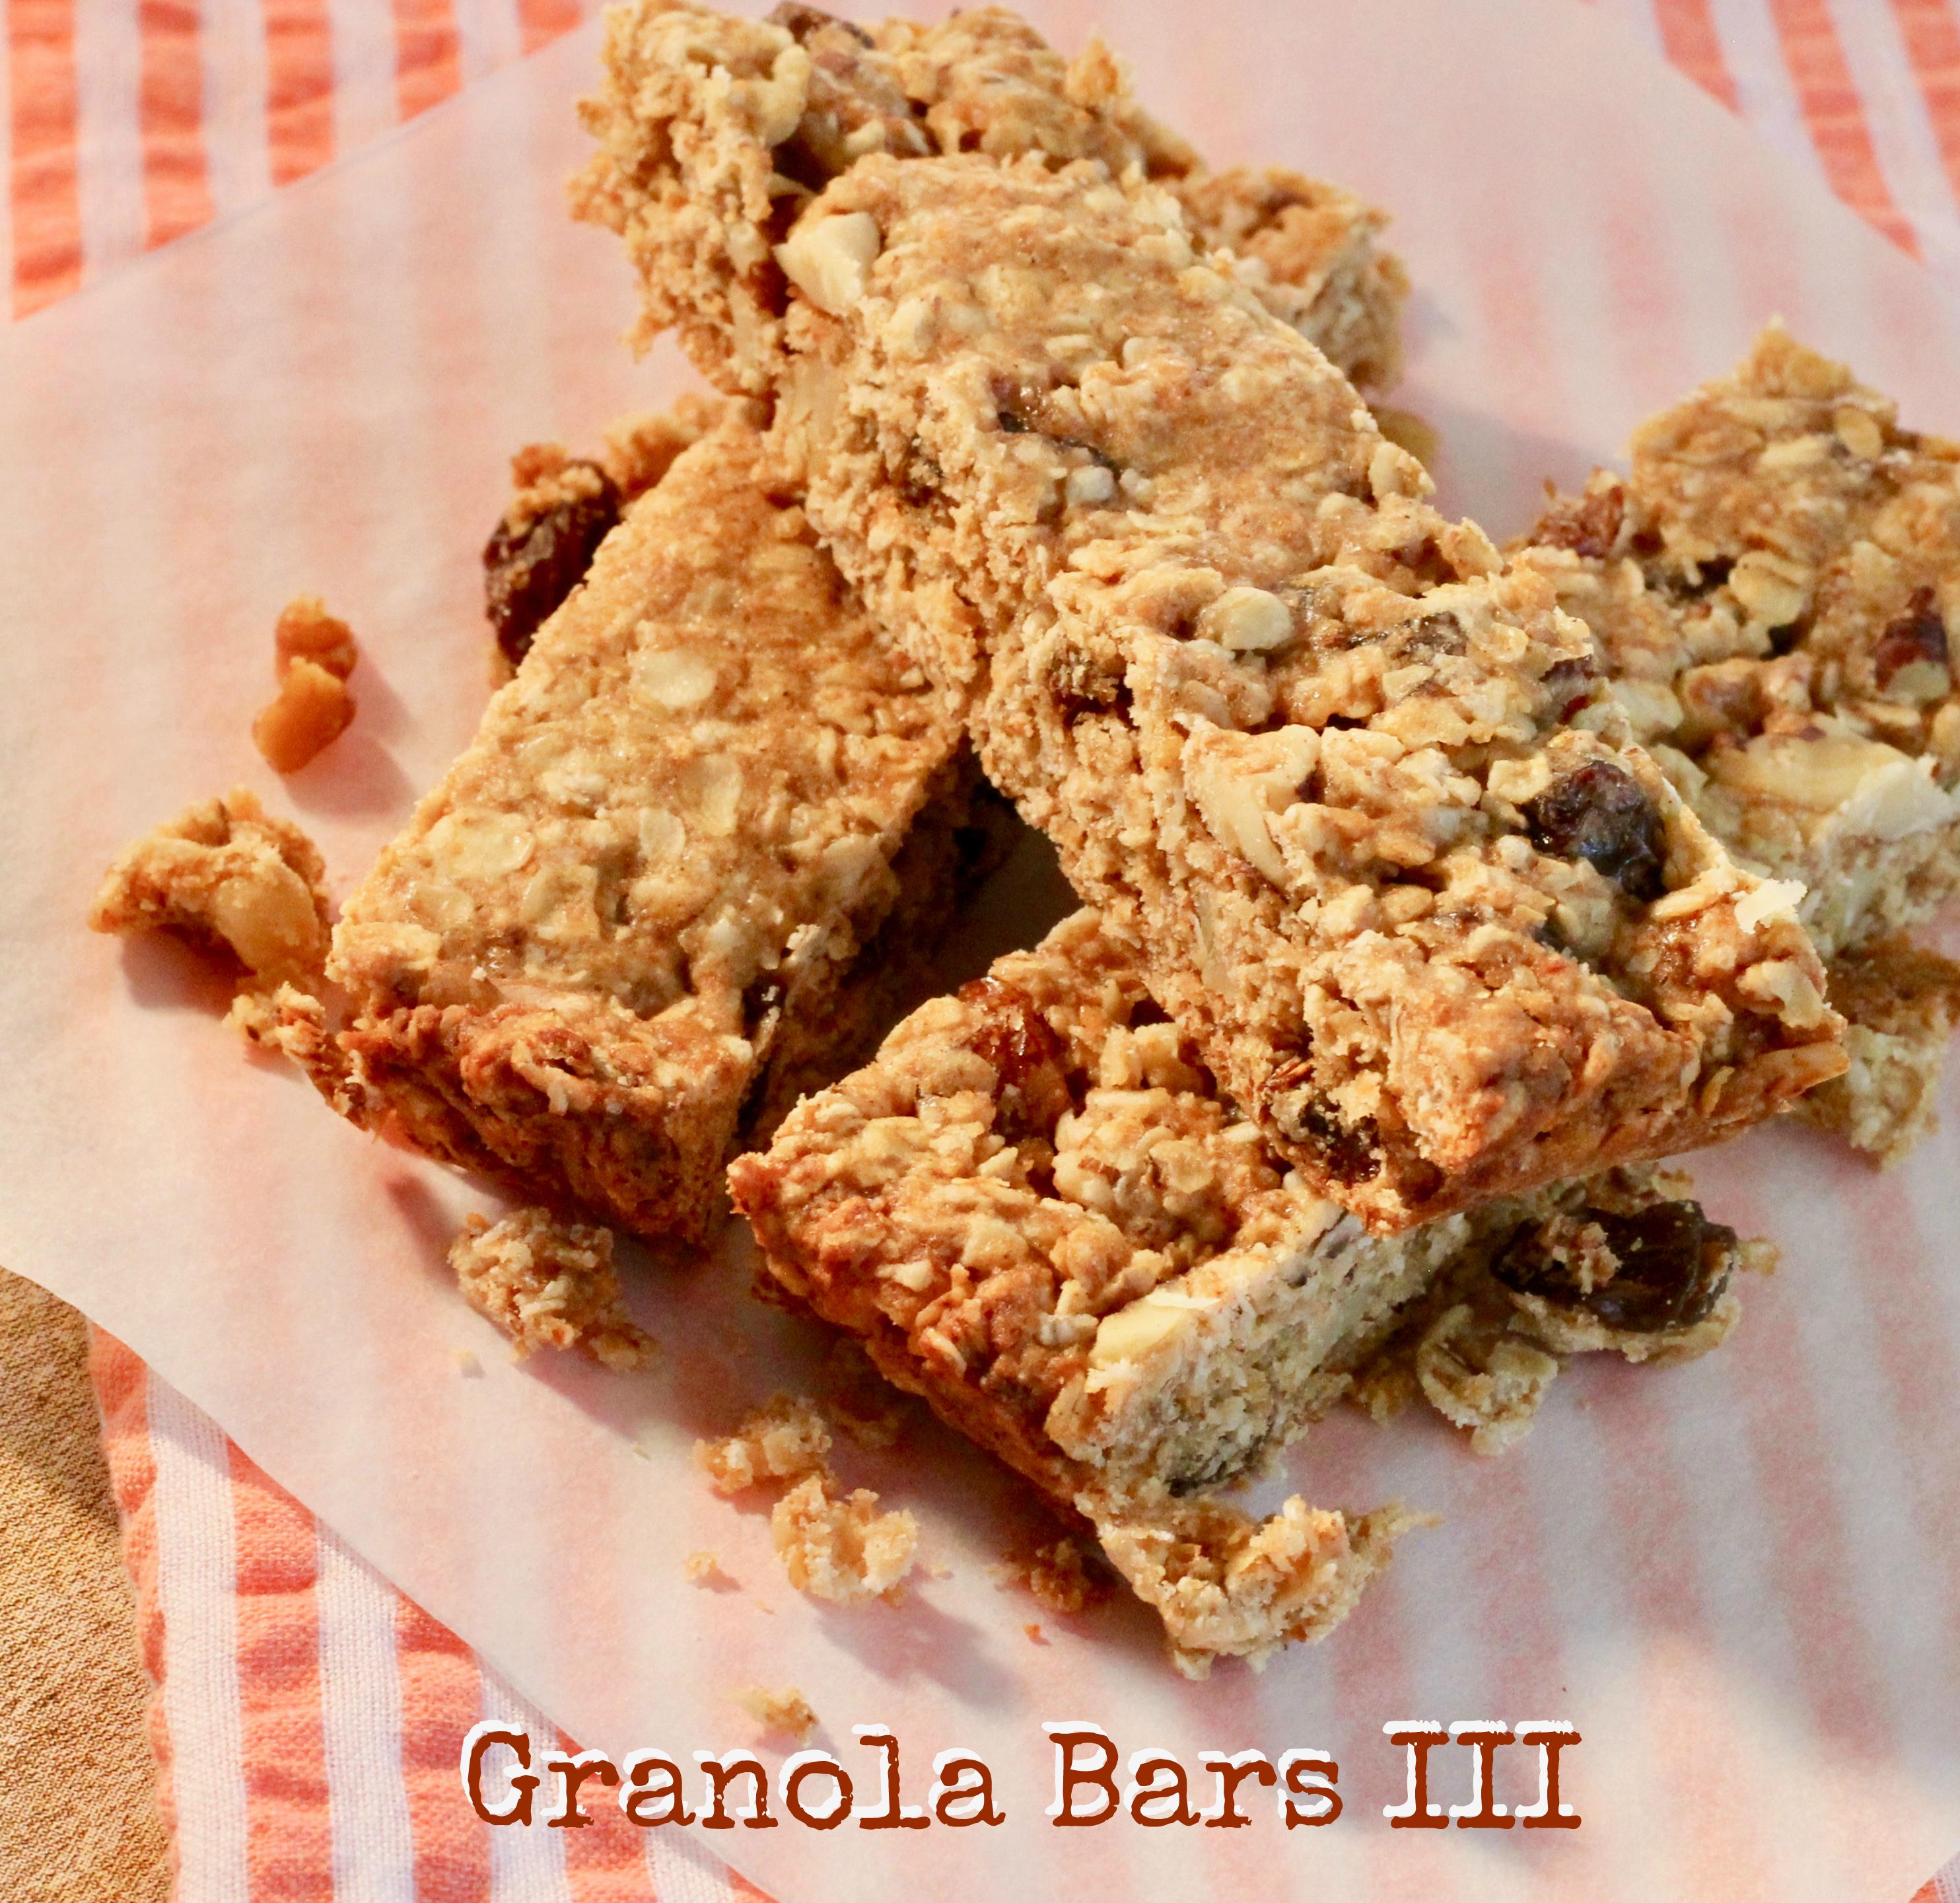 Granola Bars III